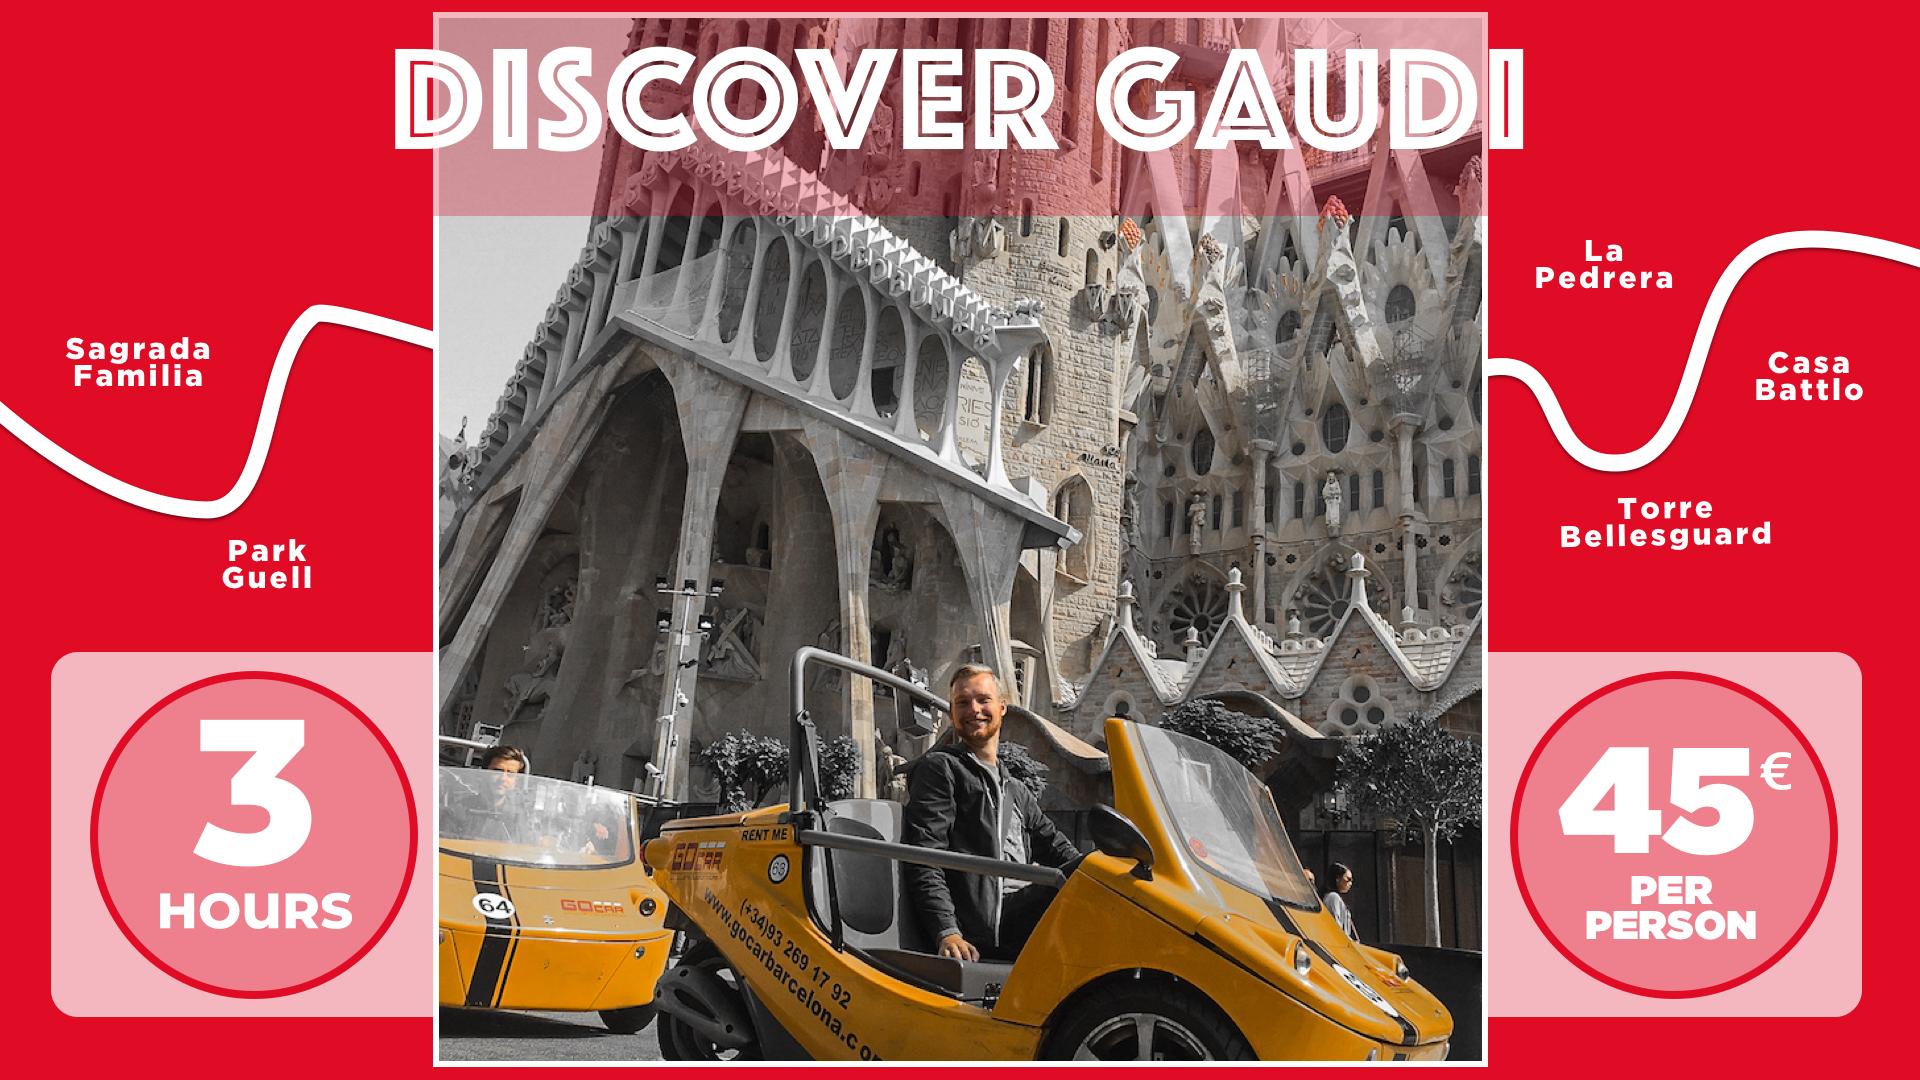 Discover Gaudi